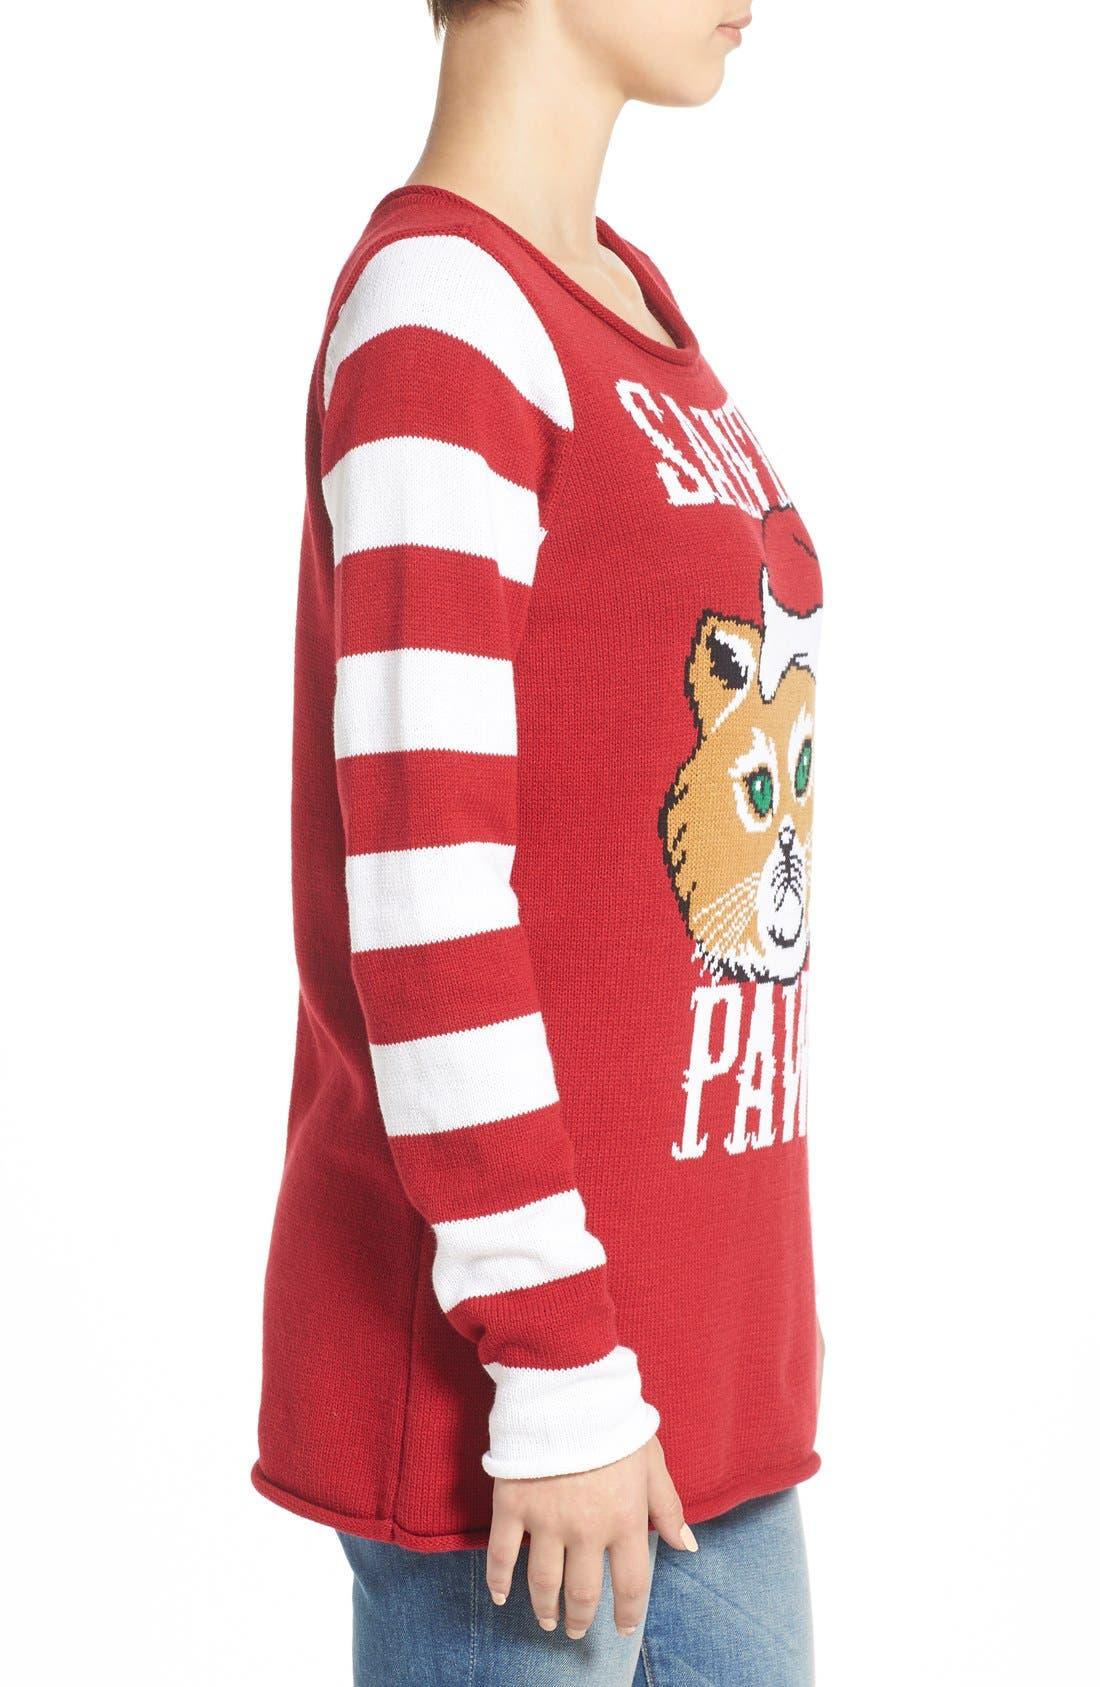 Christmas Sweater Santa Paws | www.topsimages.com